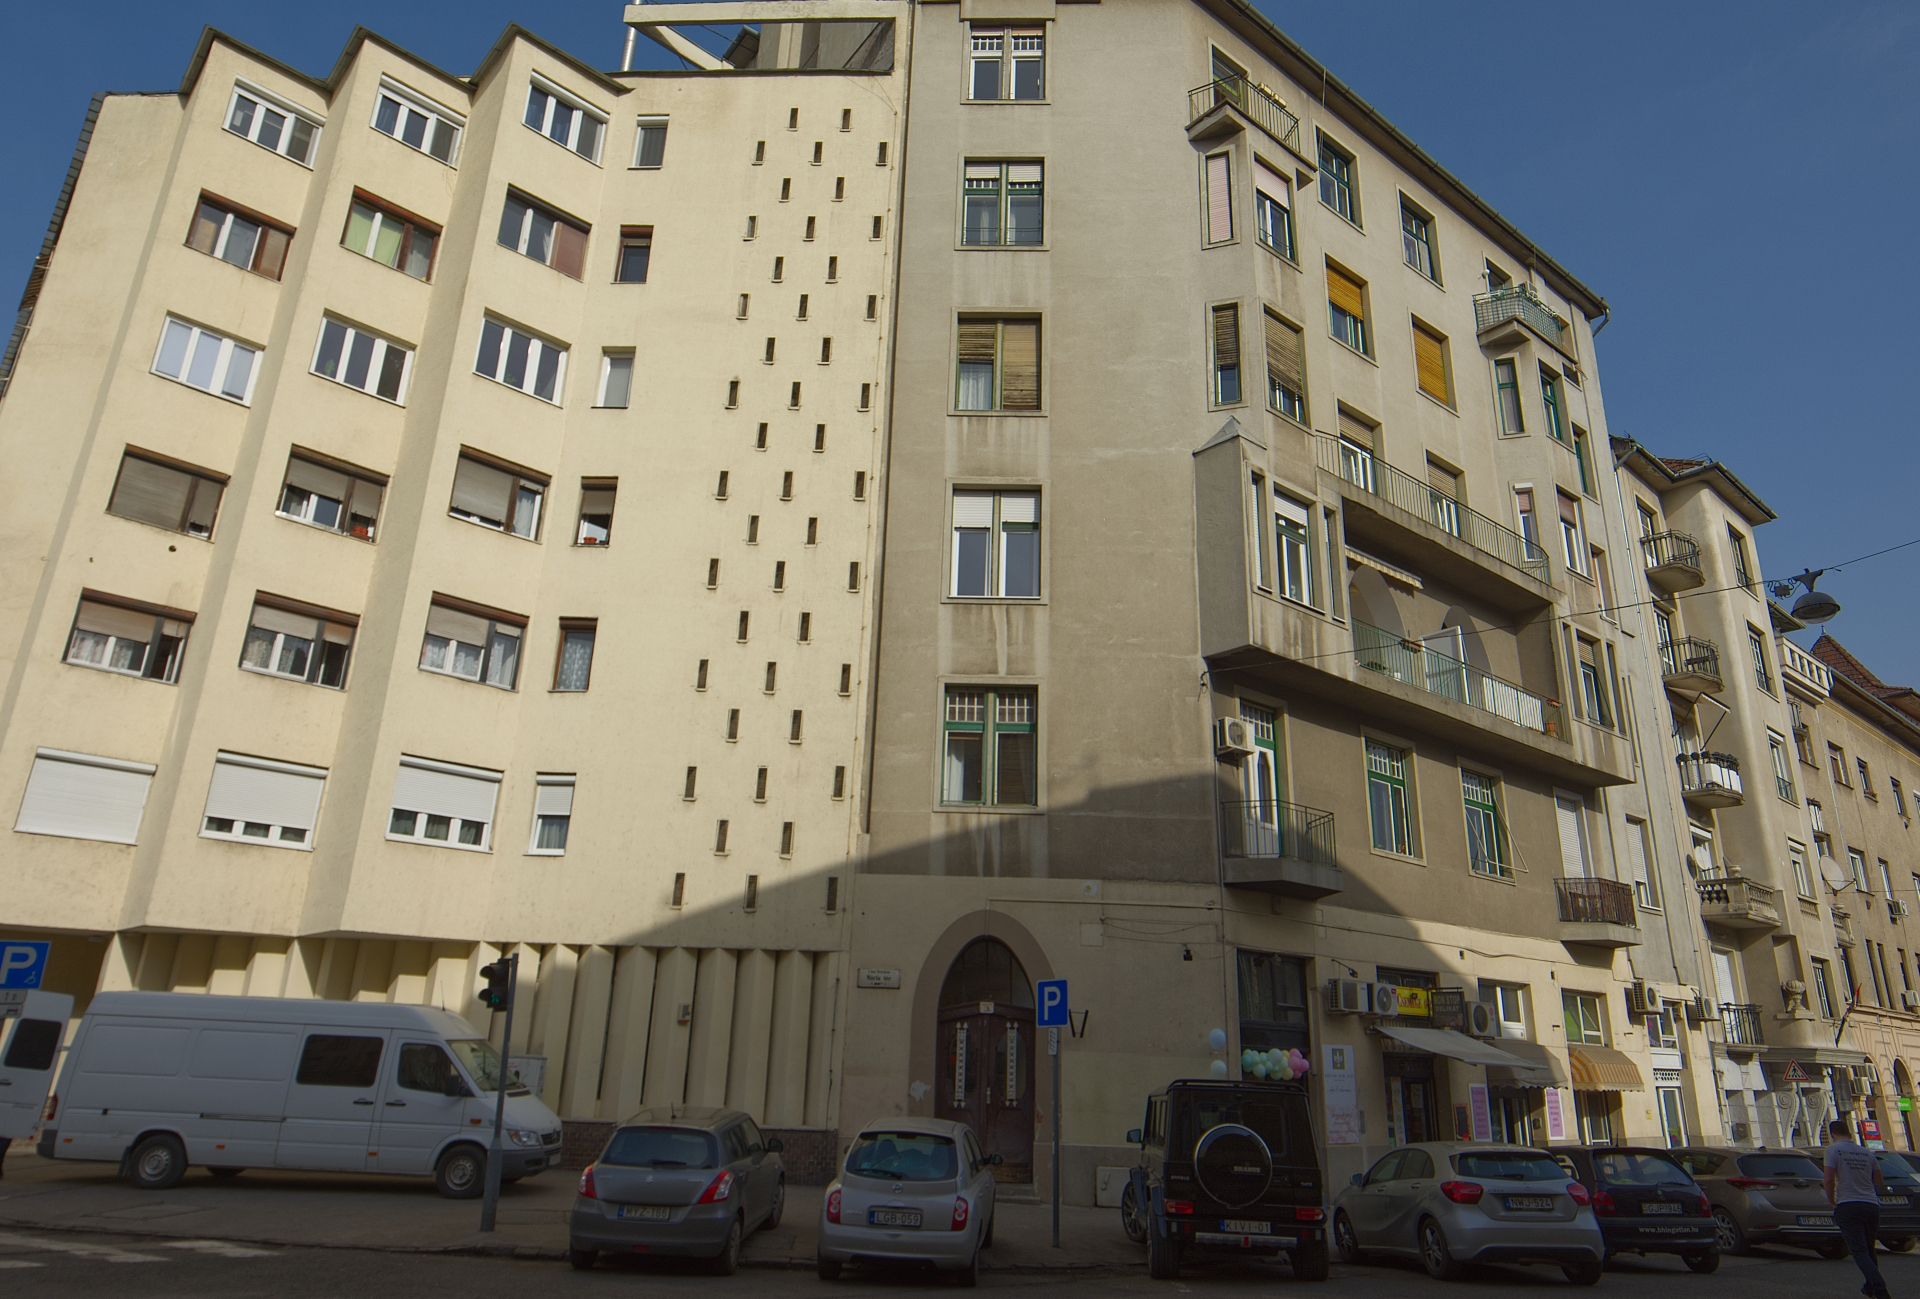 District 1, Mária tér 3